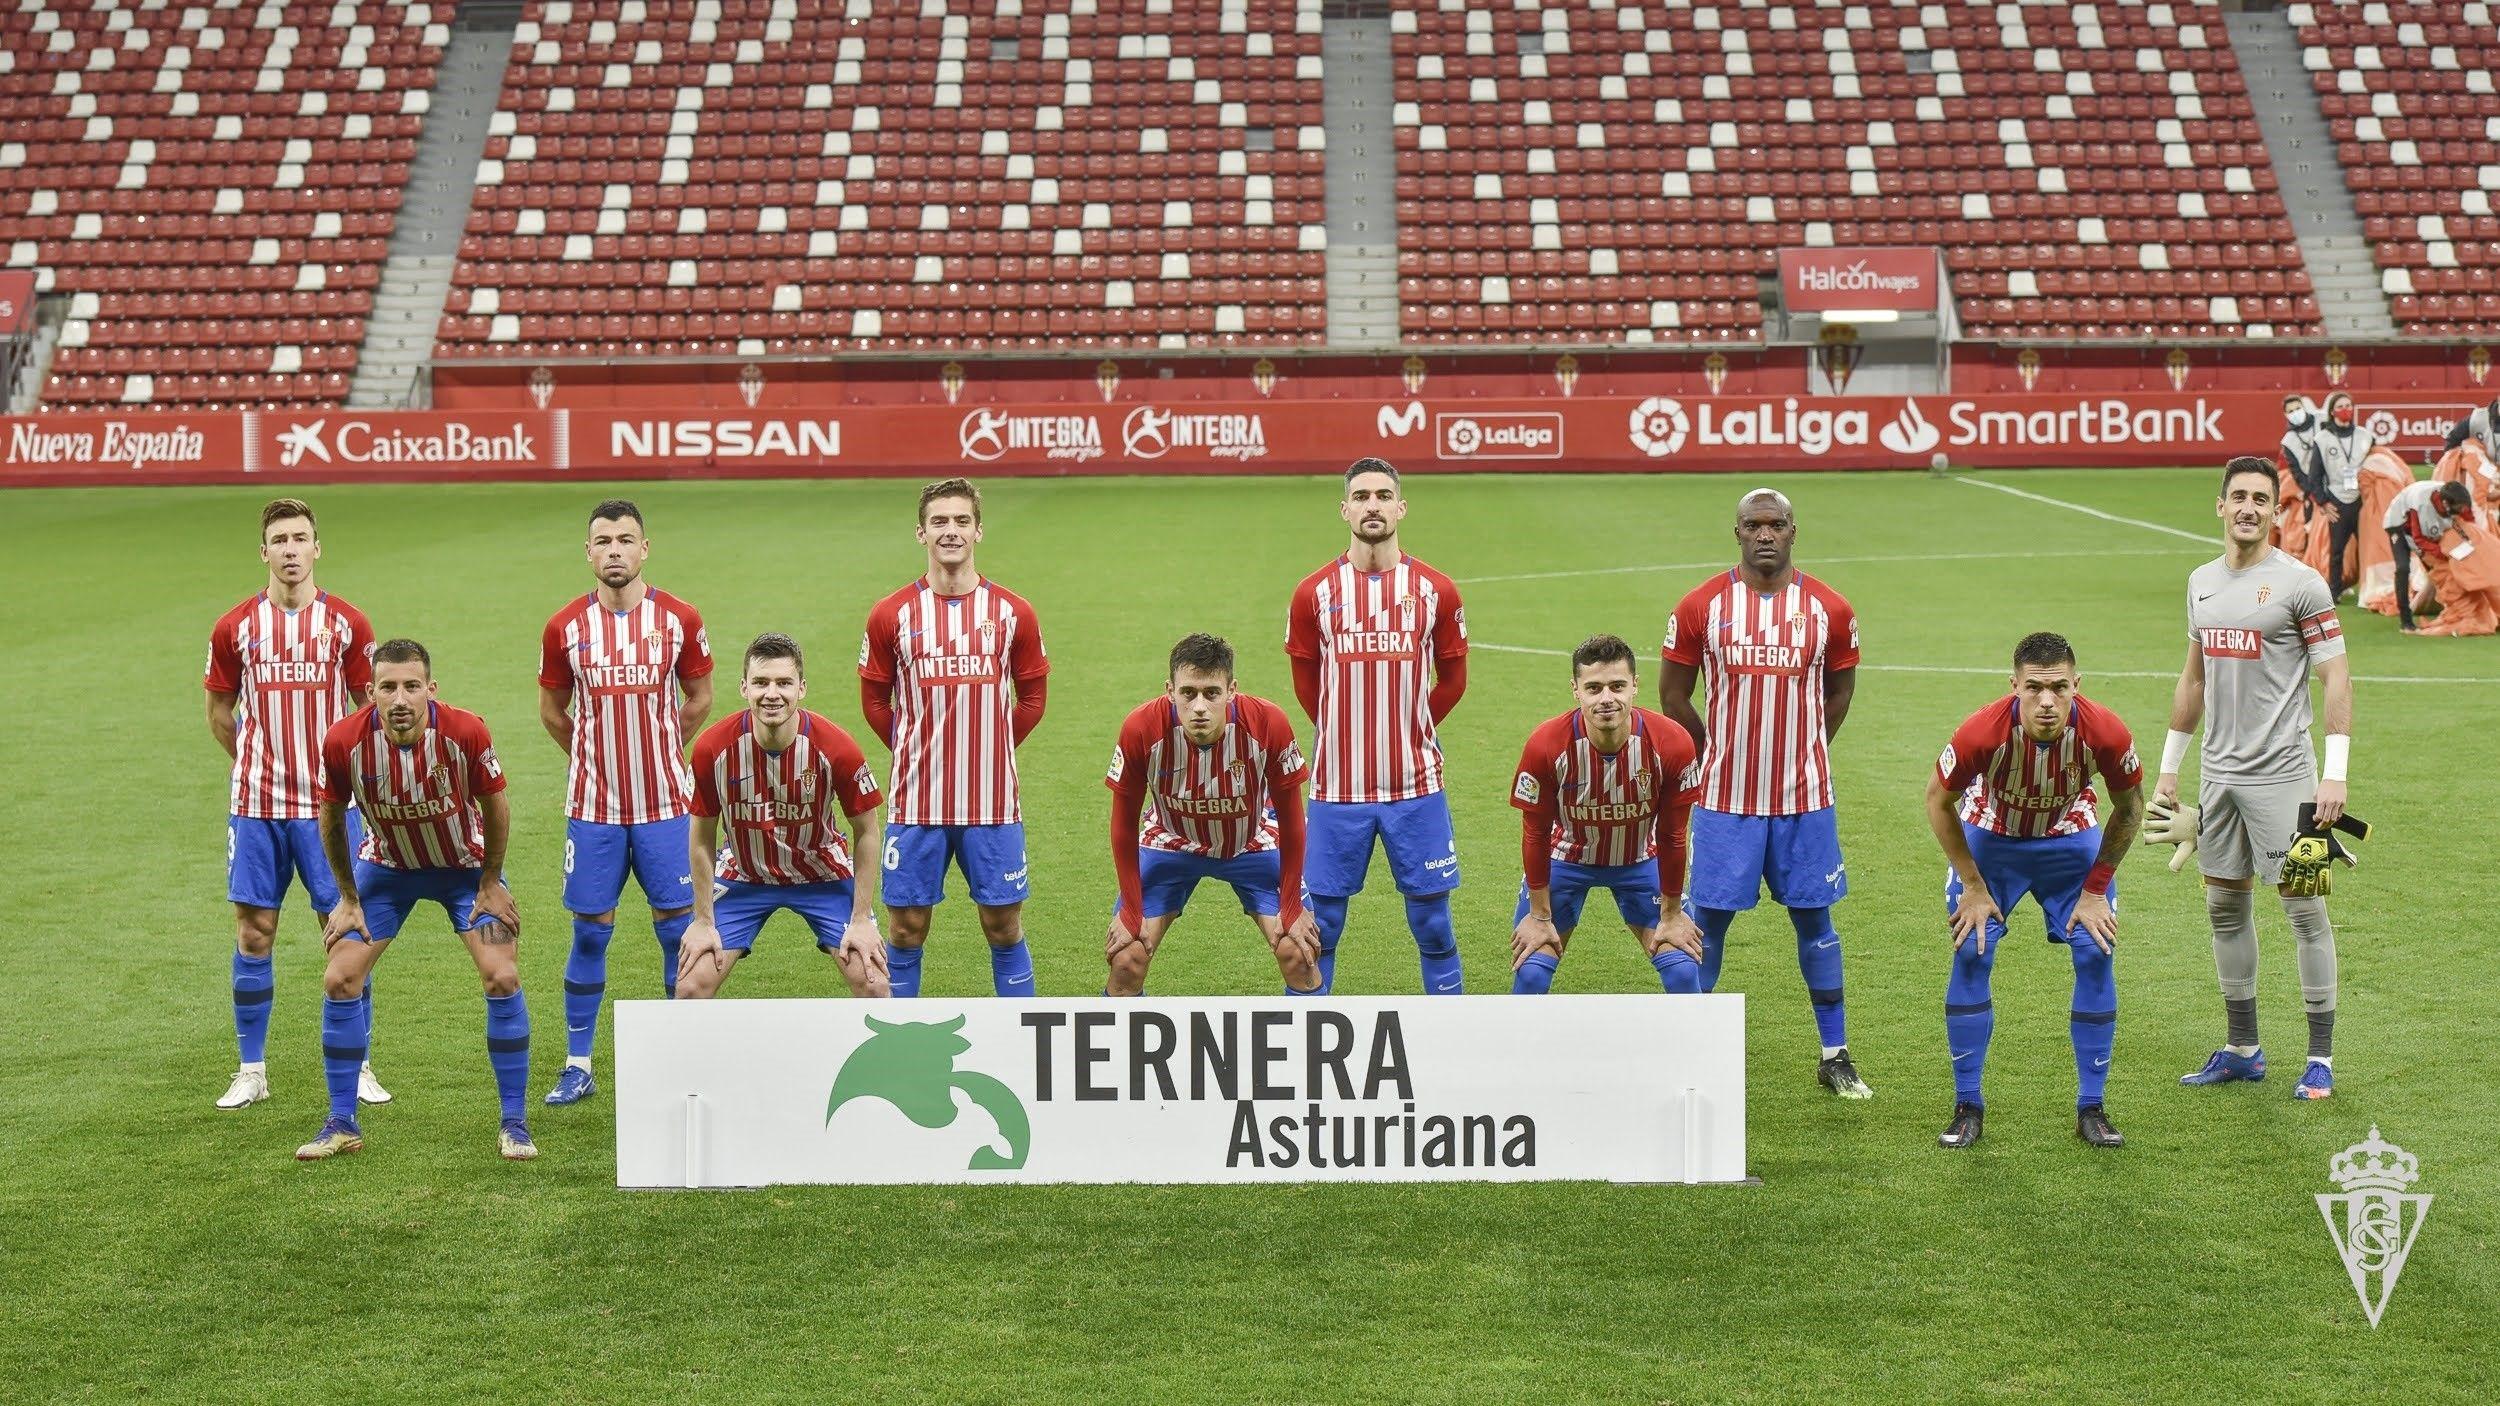 La plantilla de l'Sporting de Gijón, en arxiu | Europa Press